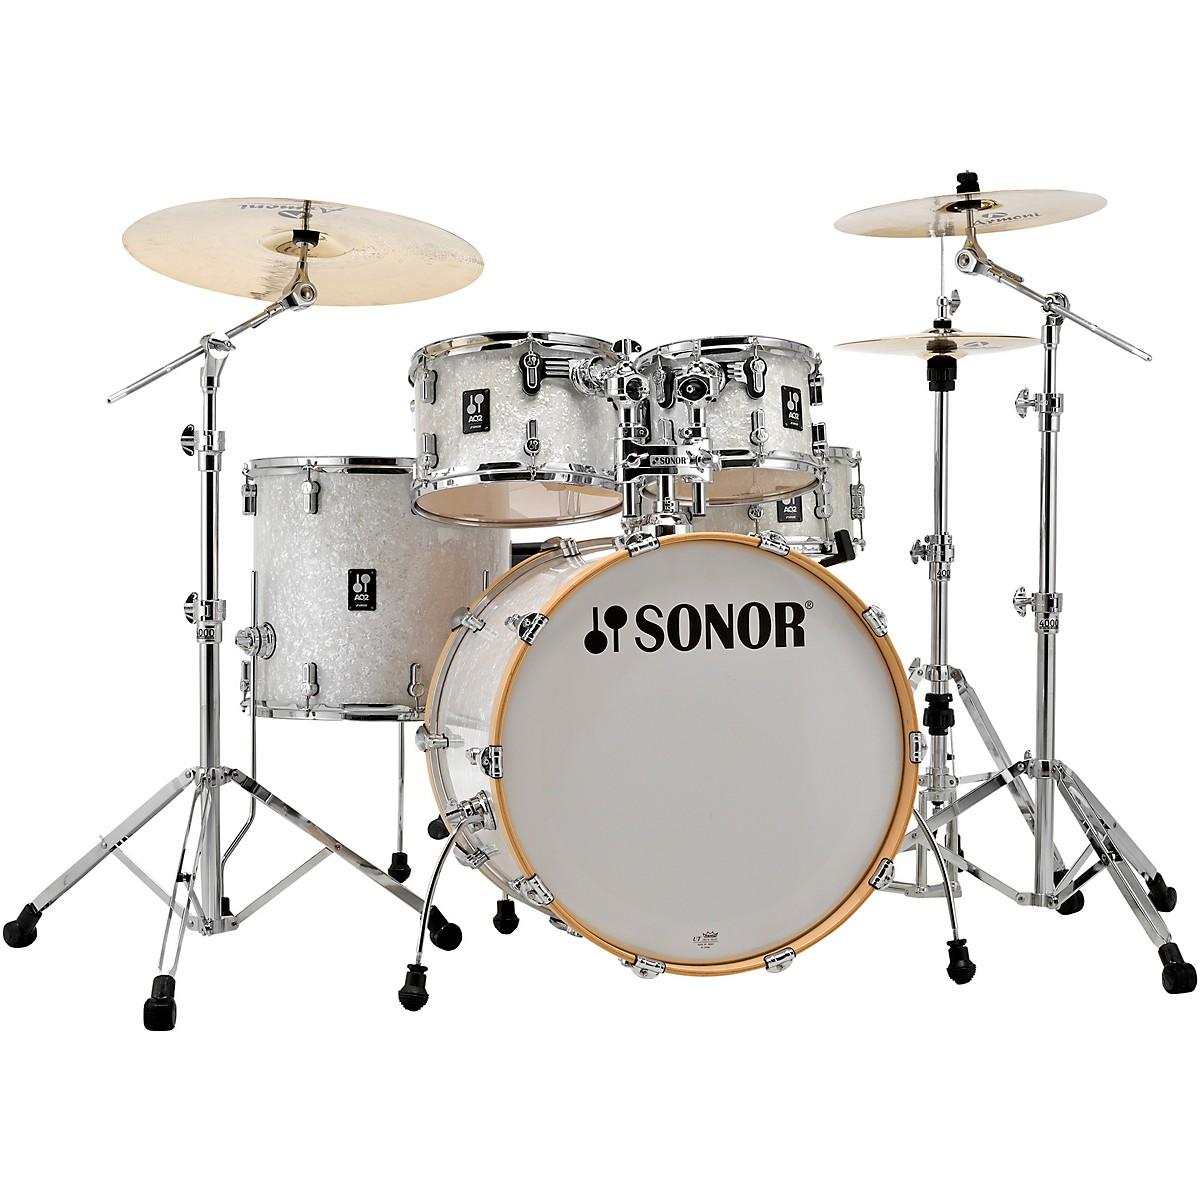 Sonor AQ2 Studio Maple 5-Piece Shell Pack